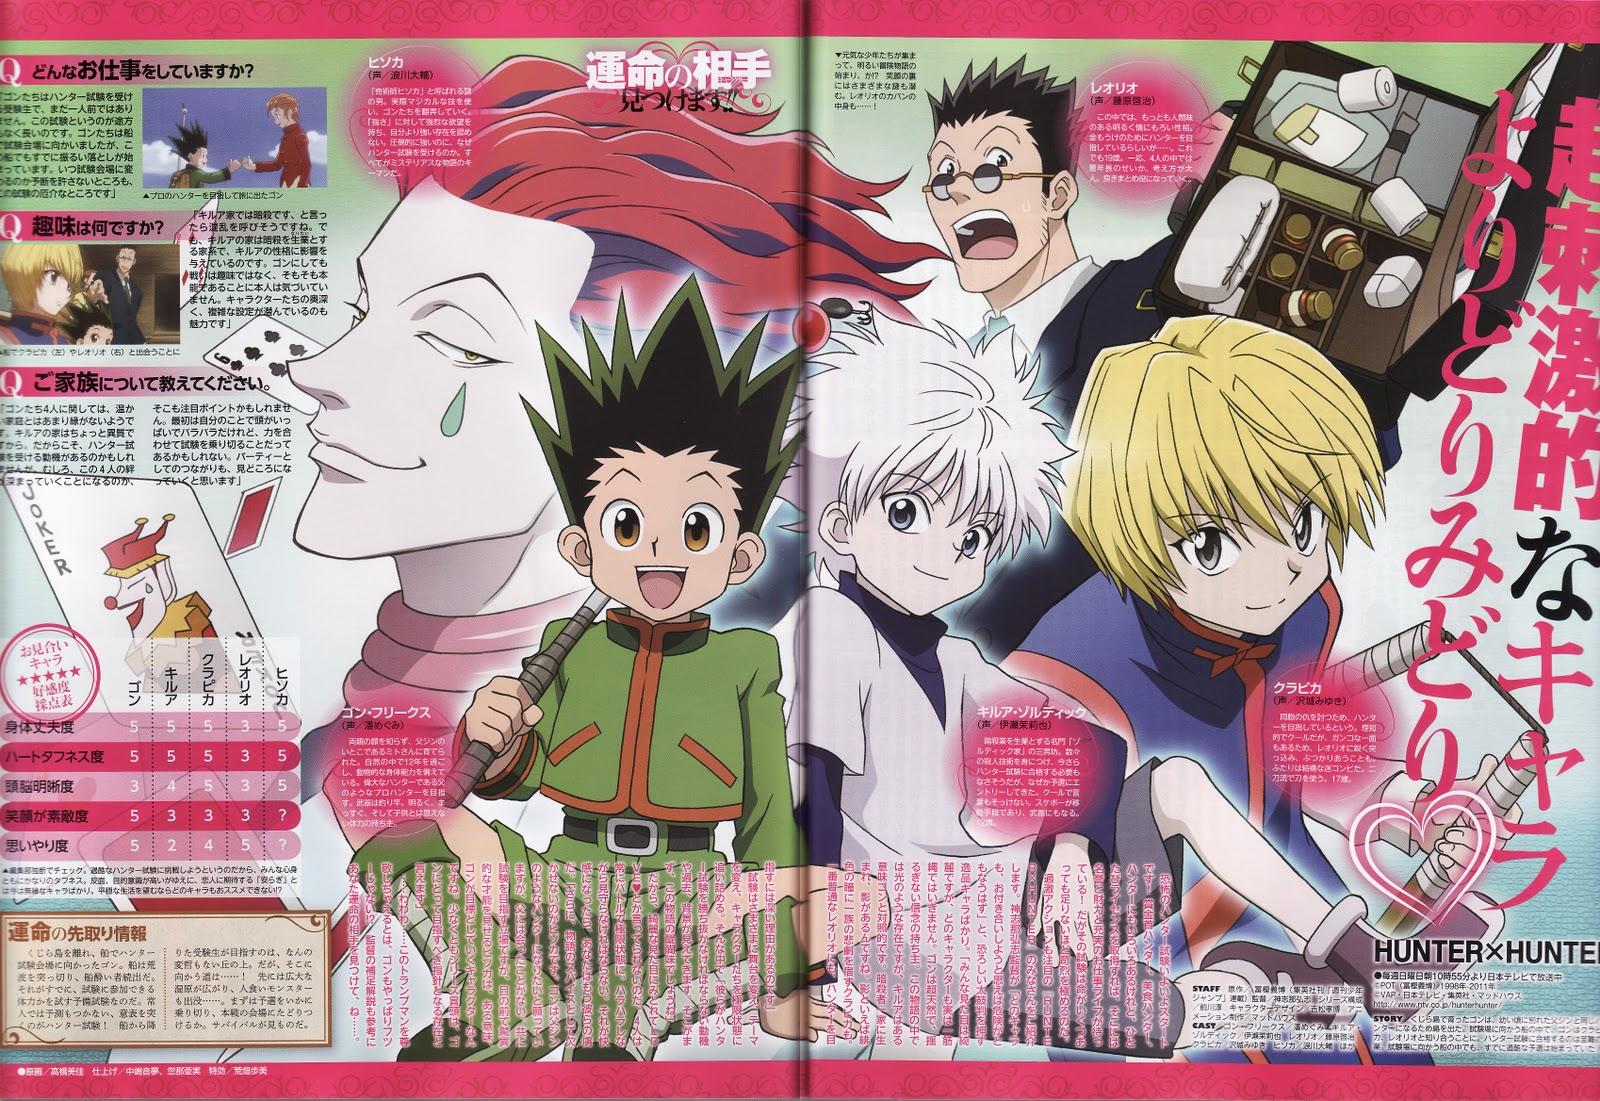 Hunter X Hunter Official Art Scan Zerochan Anime Image Board